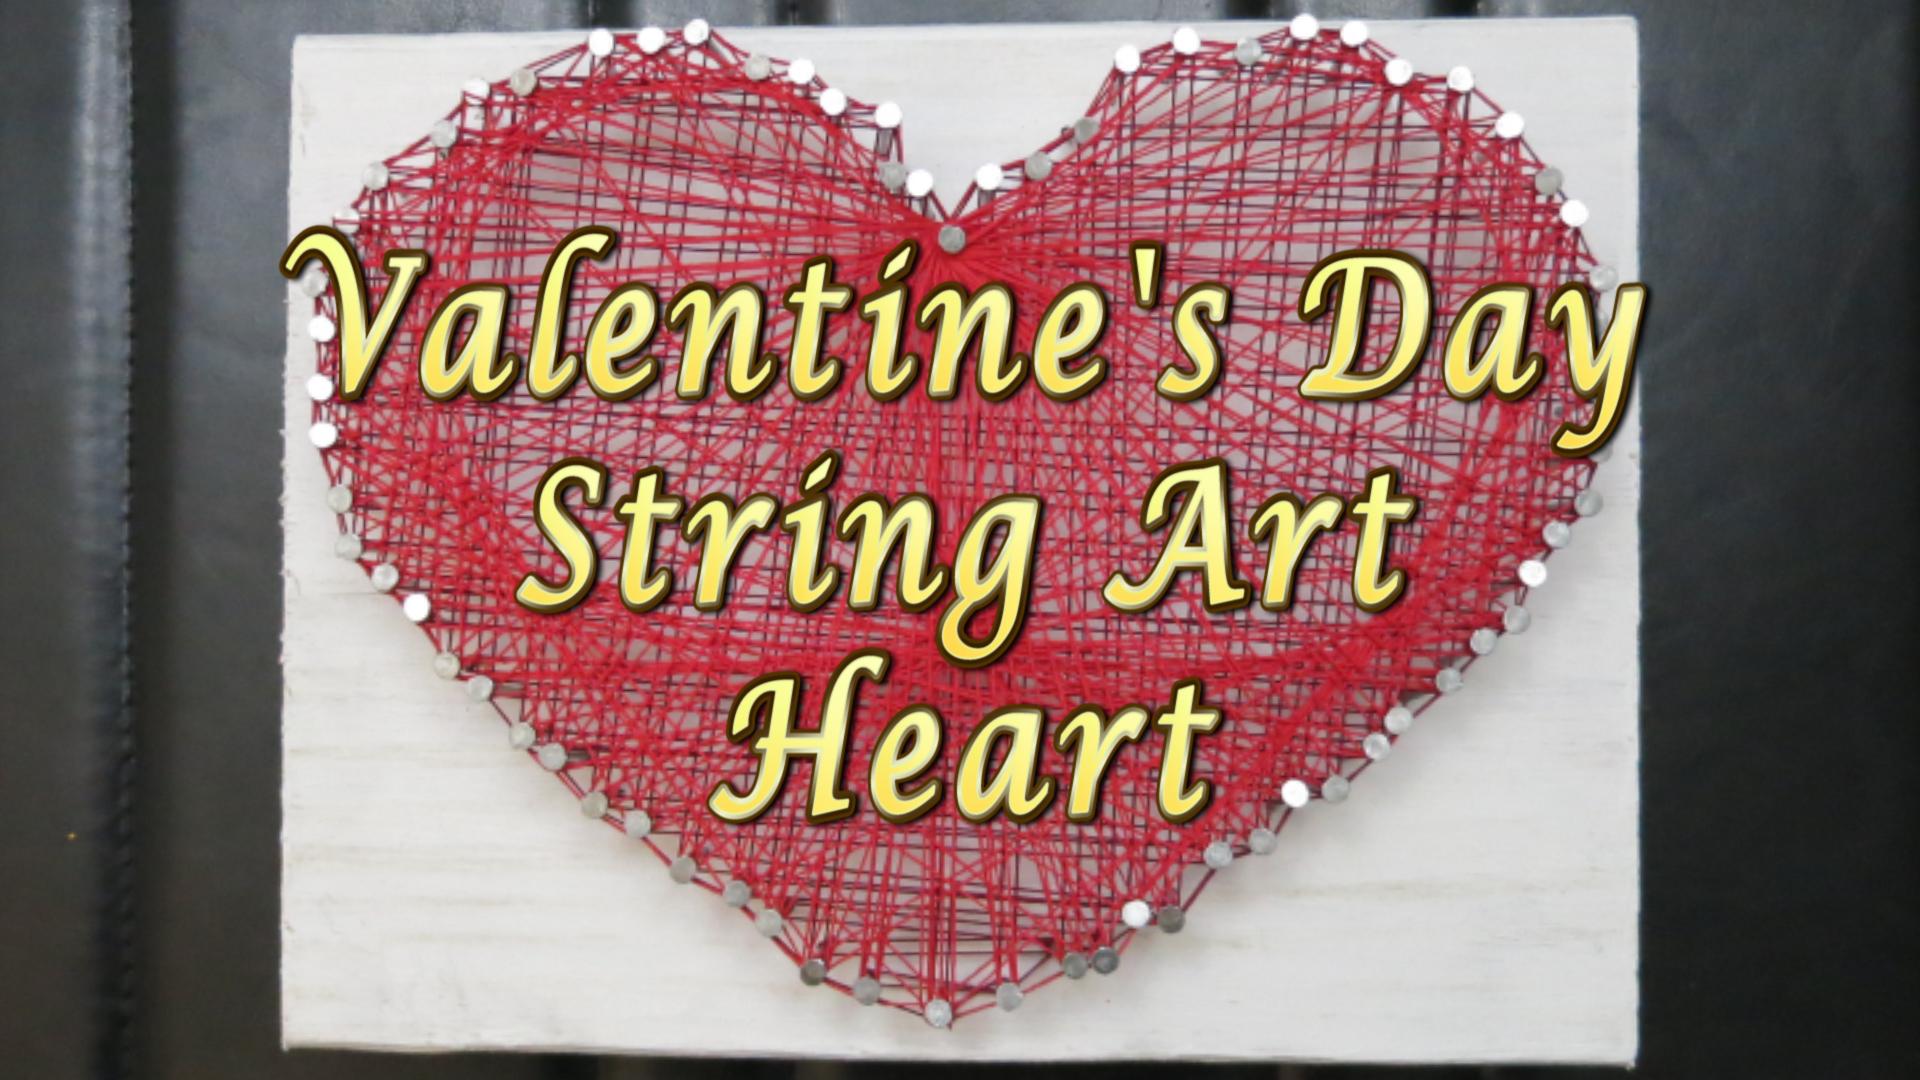 Red Valentines Day Heart String Art -Hey Maaa.jpg